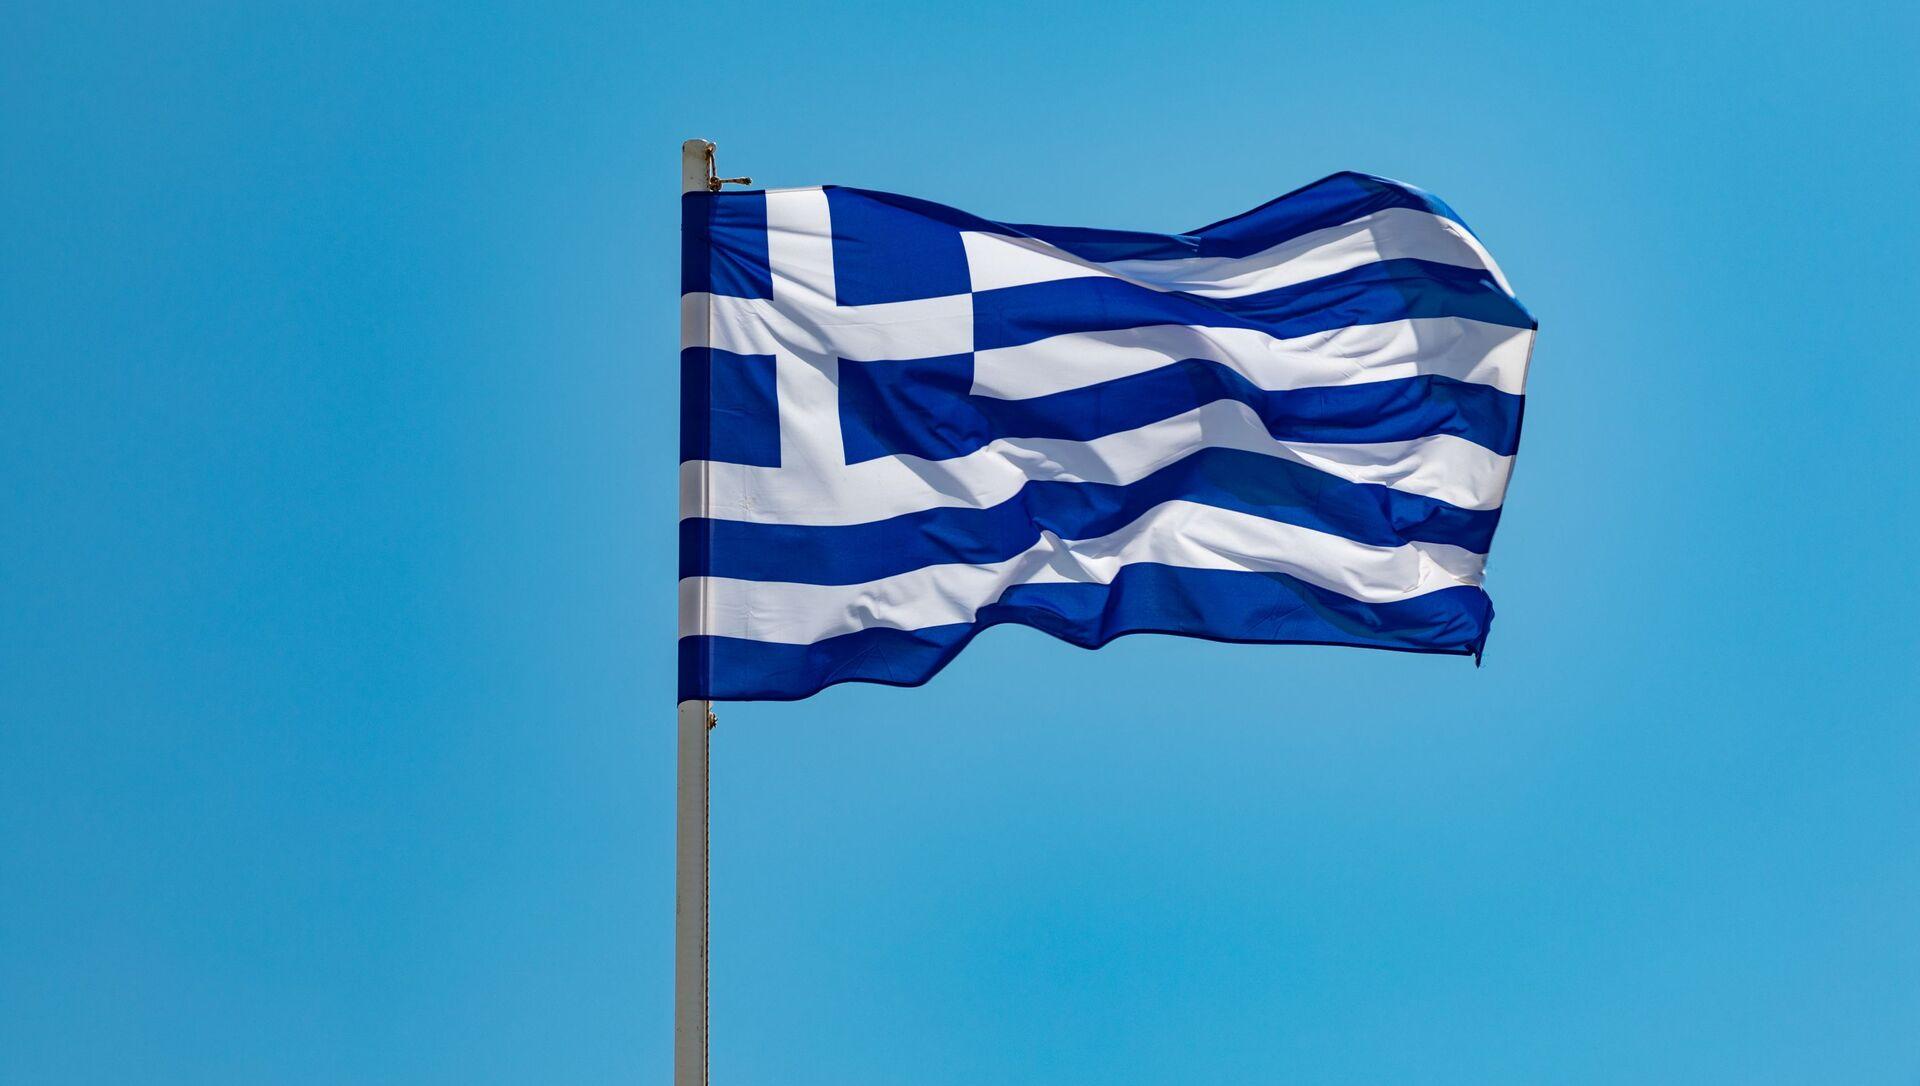 Una bandera de Grecia - Sputnik Mundo, 1920, 26.08.2020